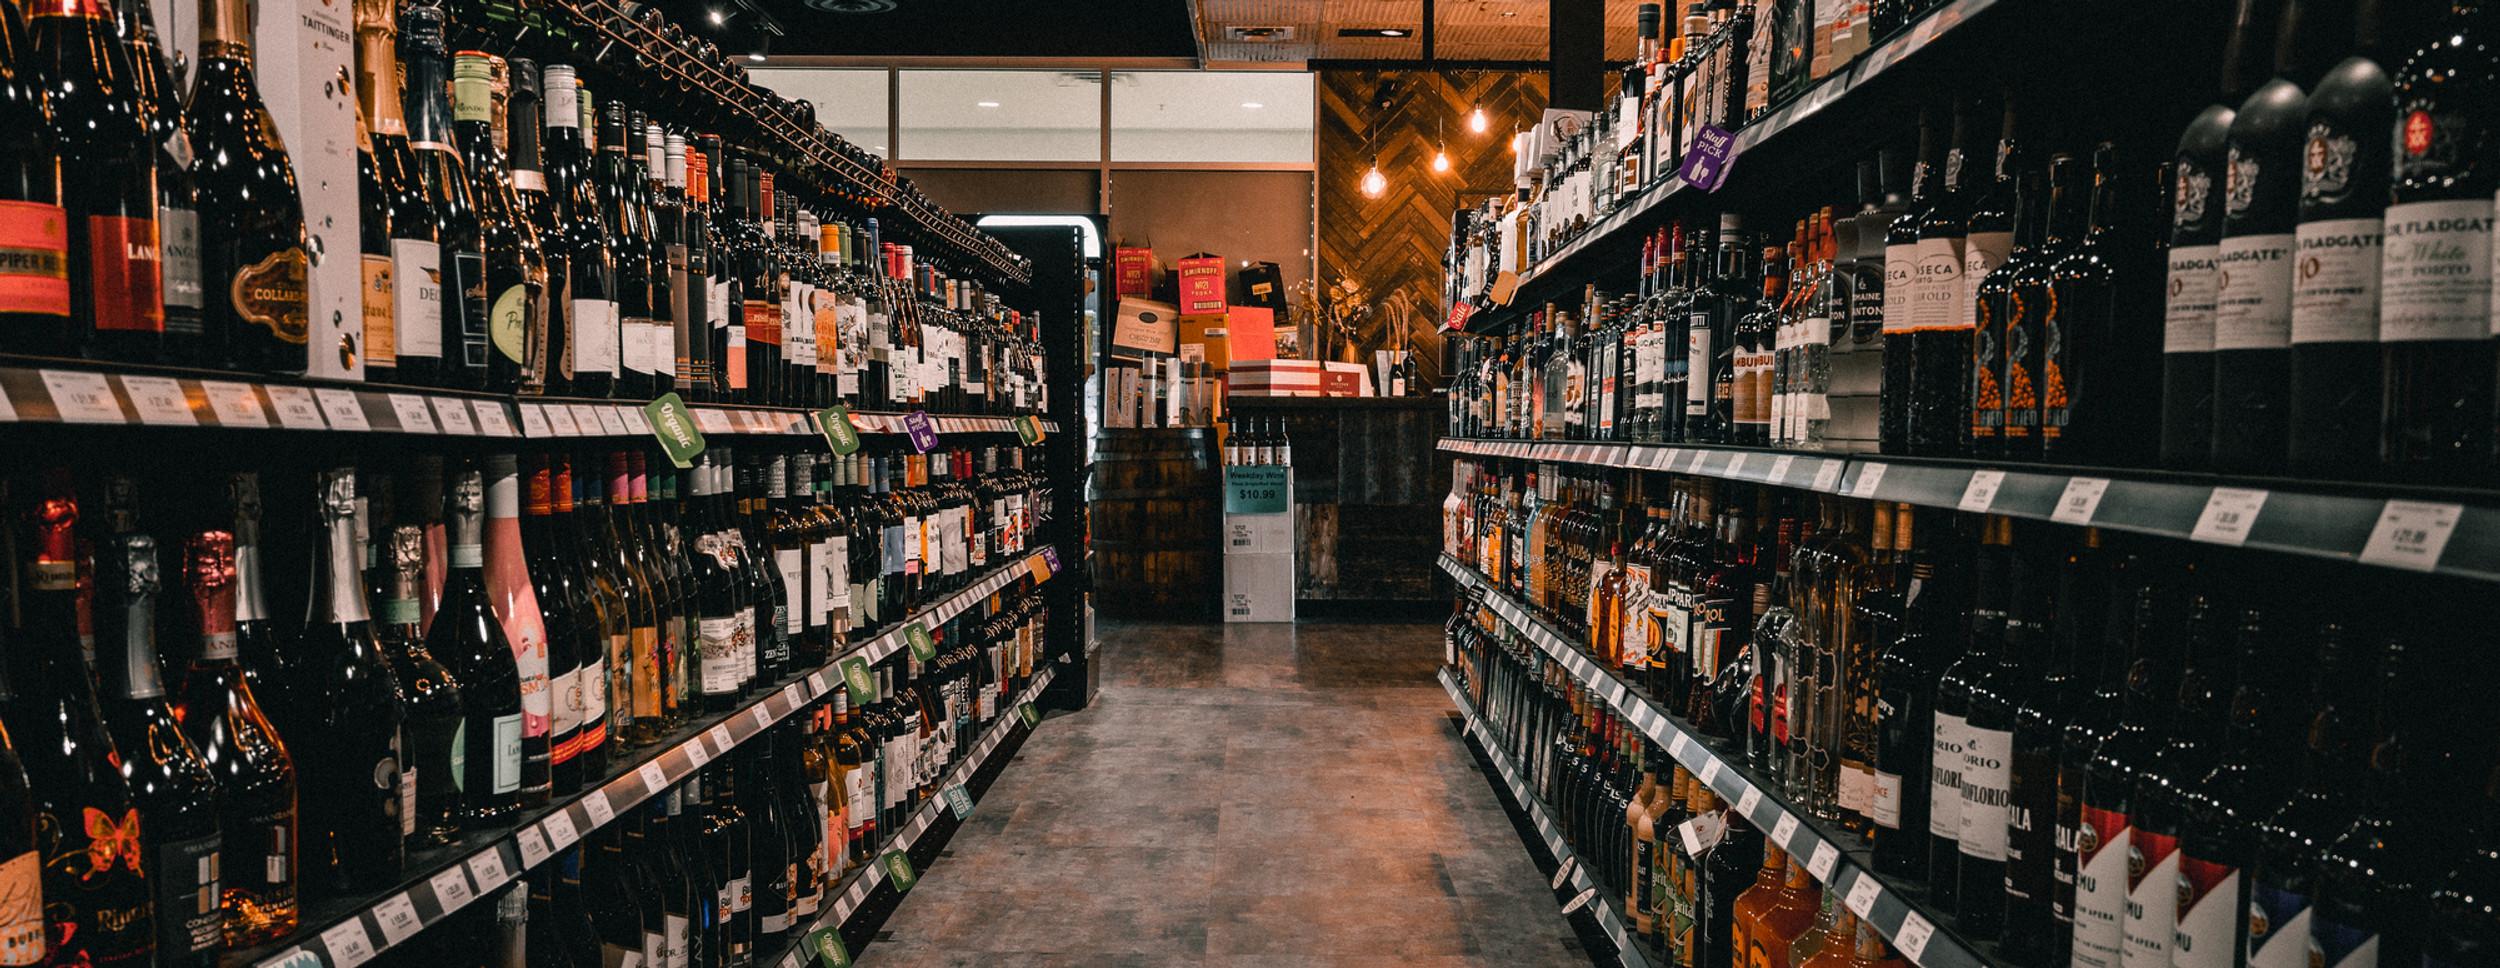 distilledliquor_websitephoto (17 of 27).